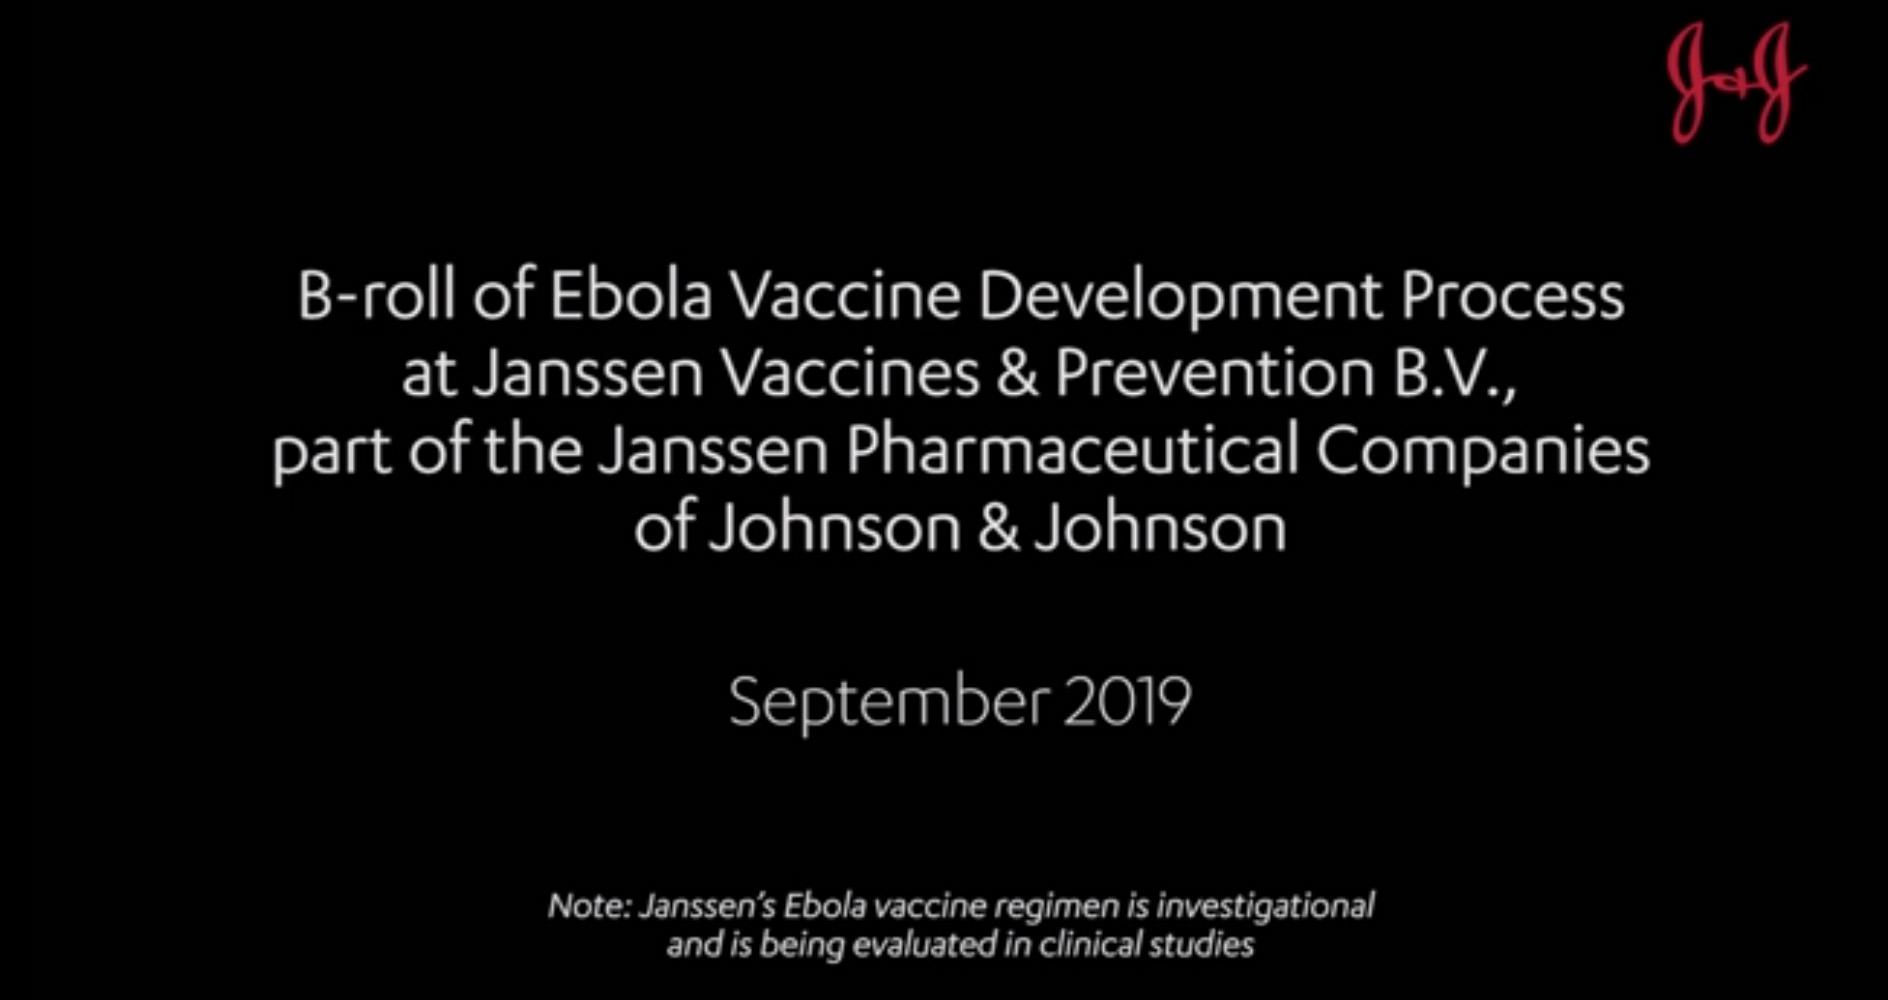 J&J Ebola Vaccine B-Roll Footage